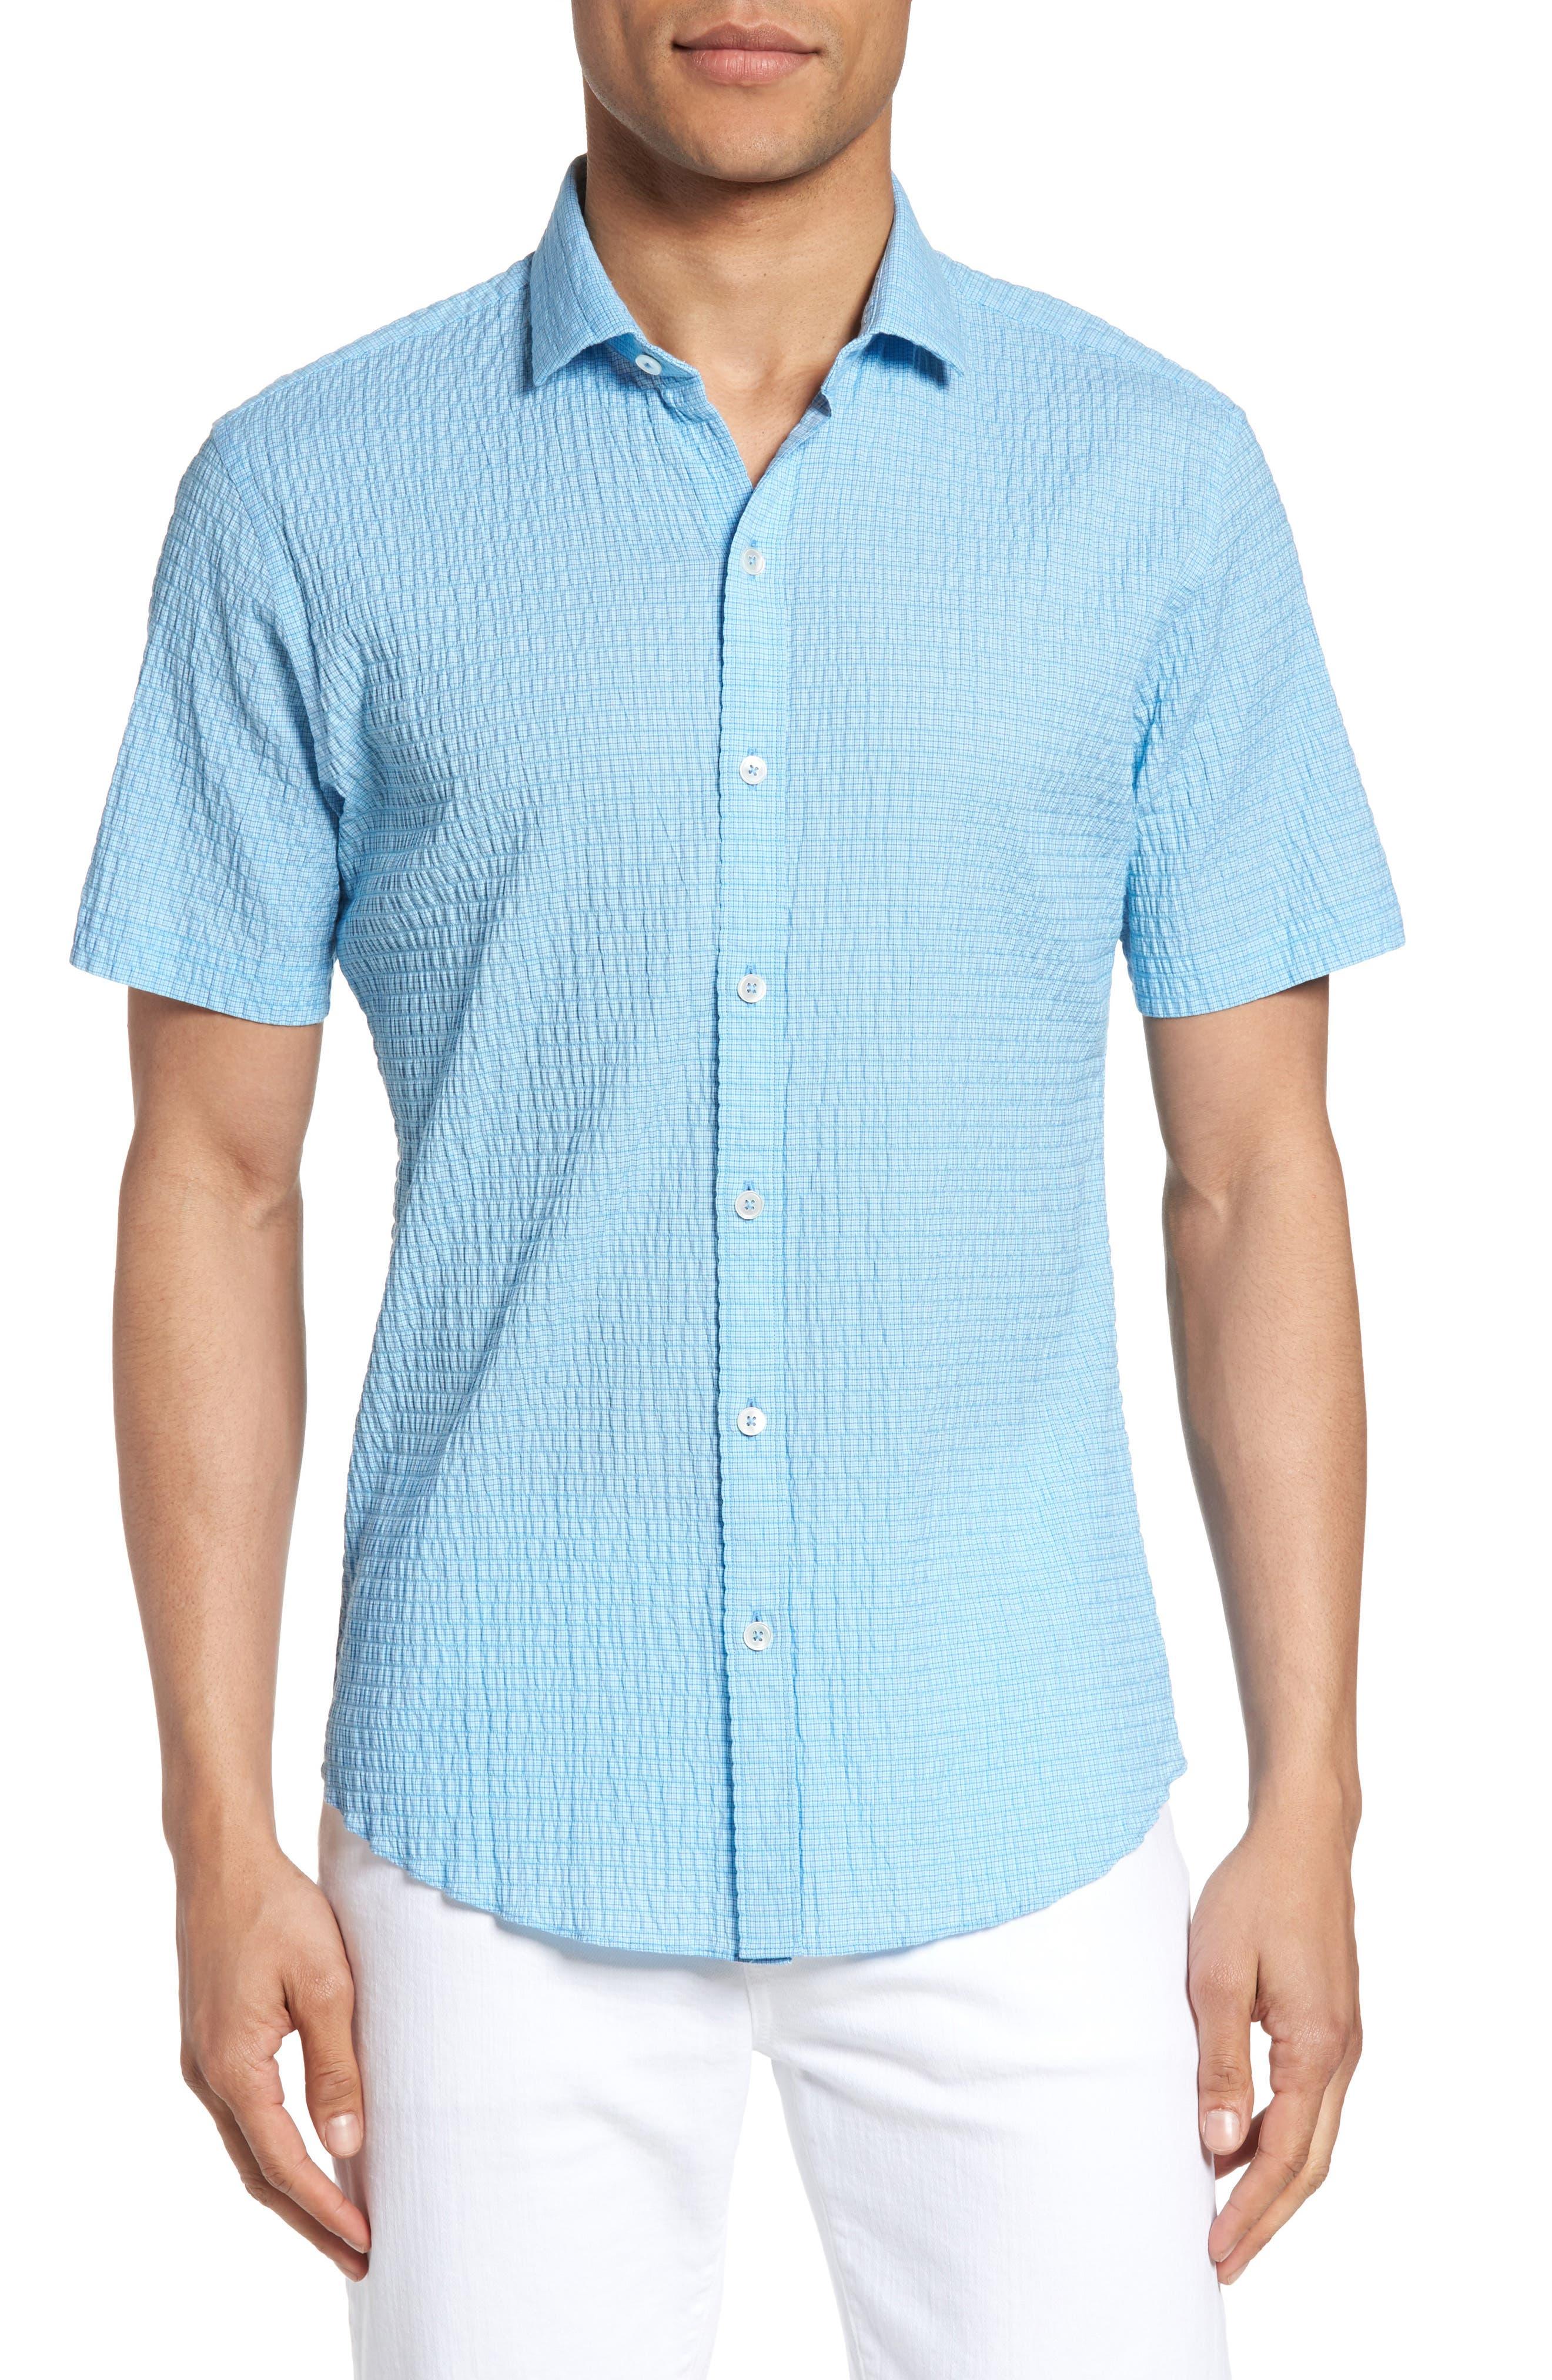 Morales Sport Shirt,                             Main thumbnail 1, color,                             Light Blue